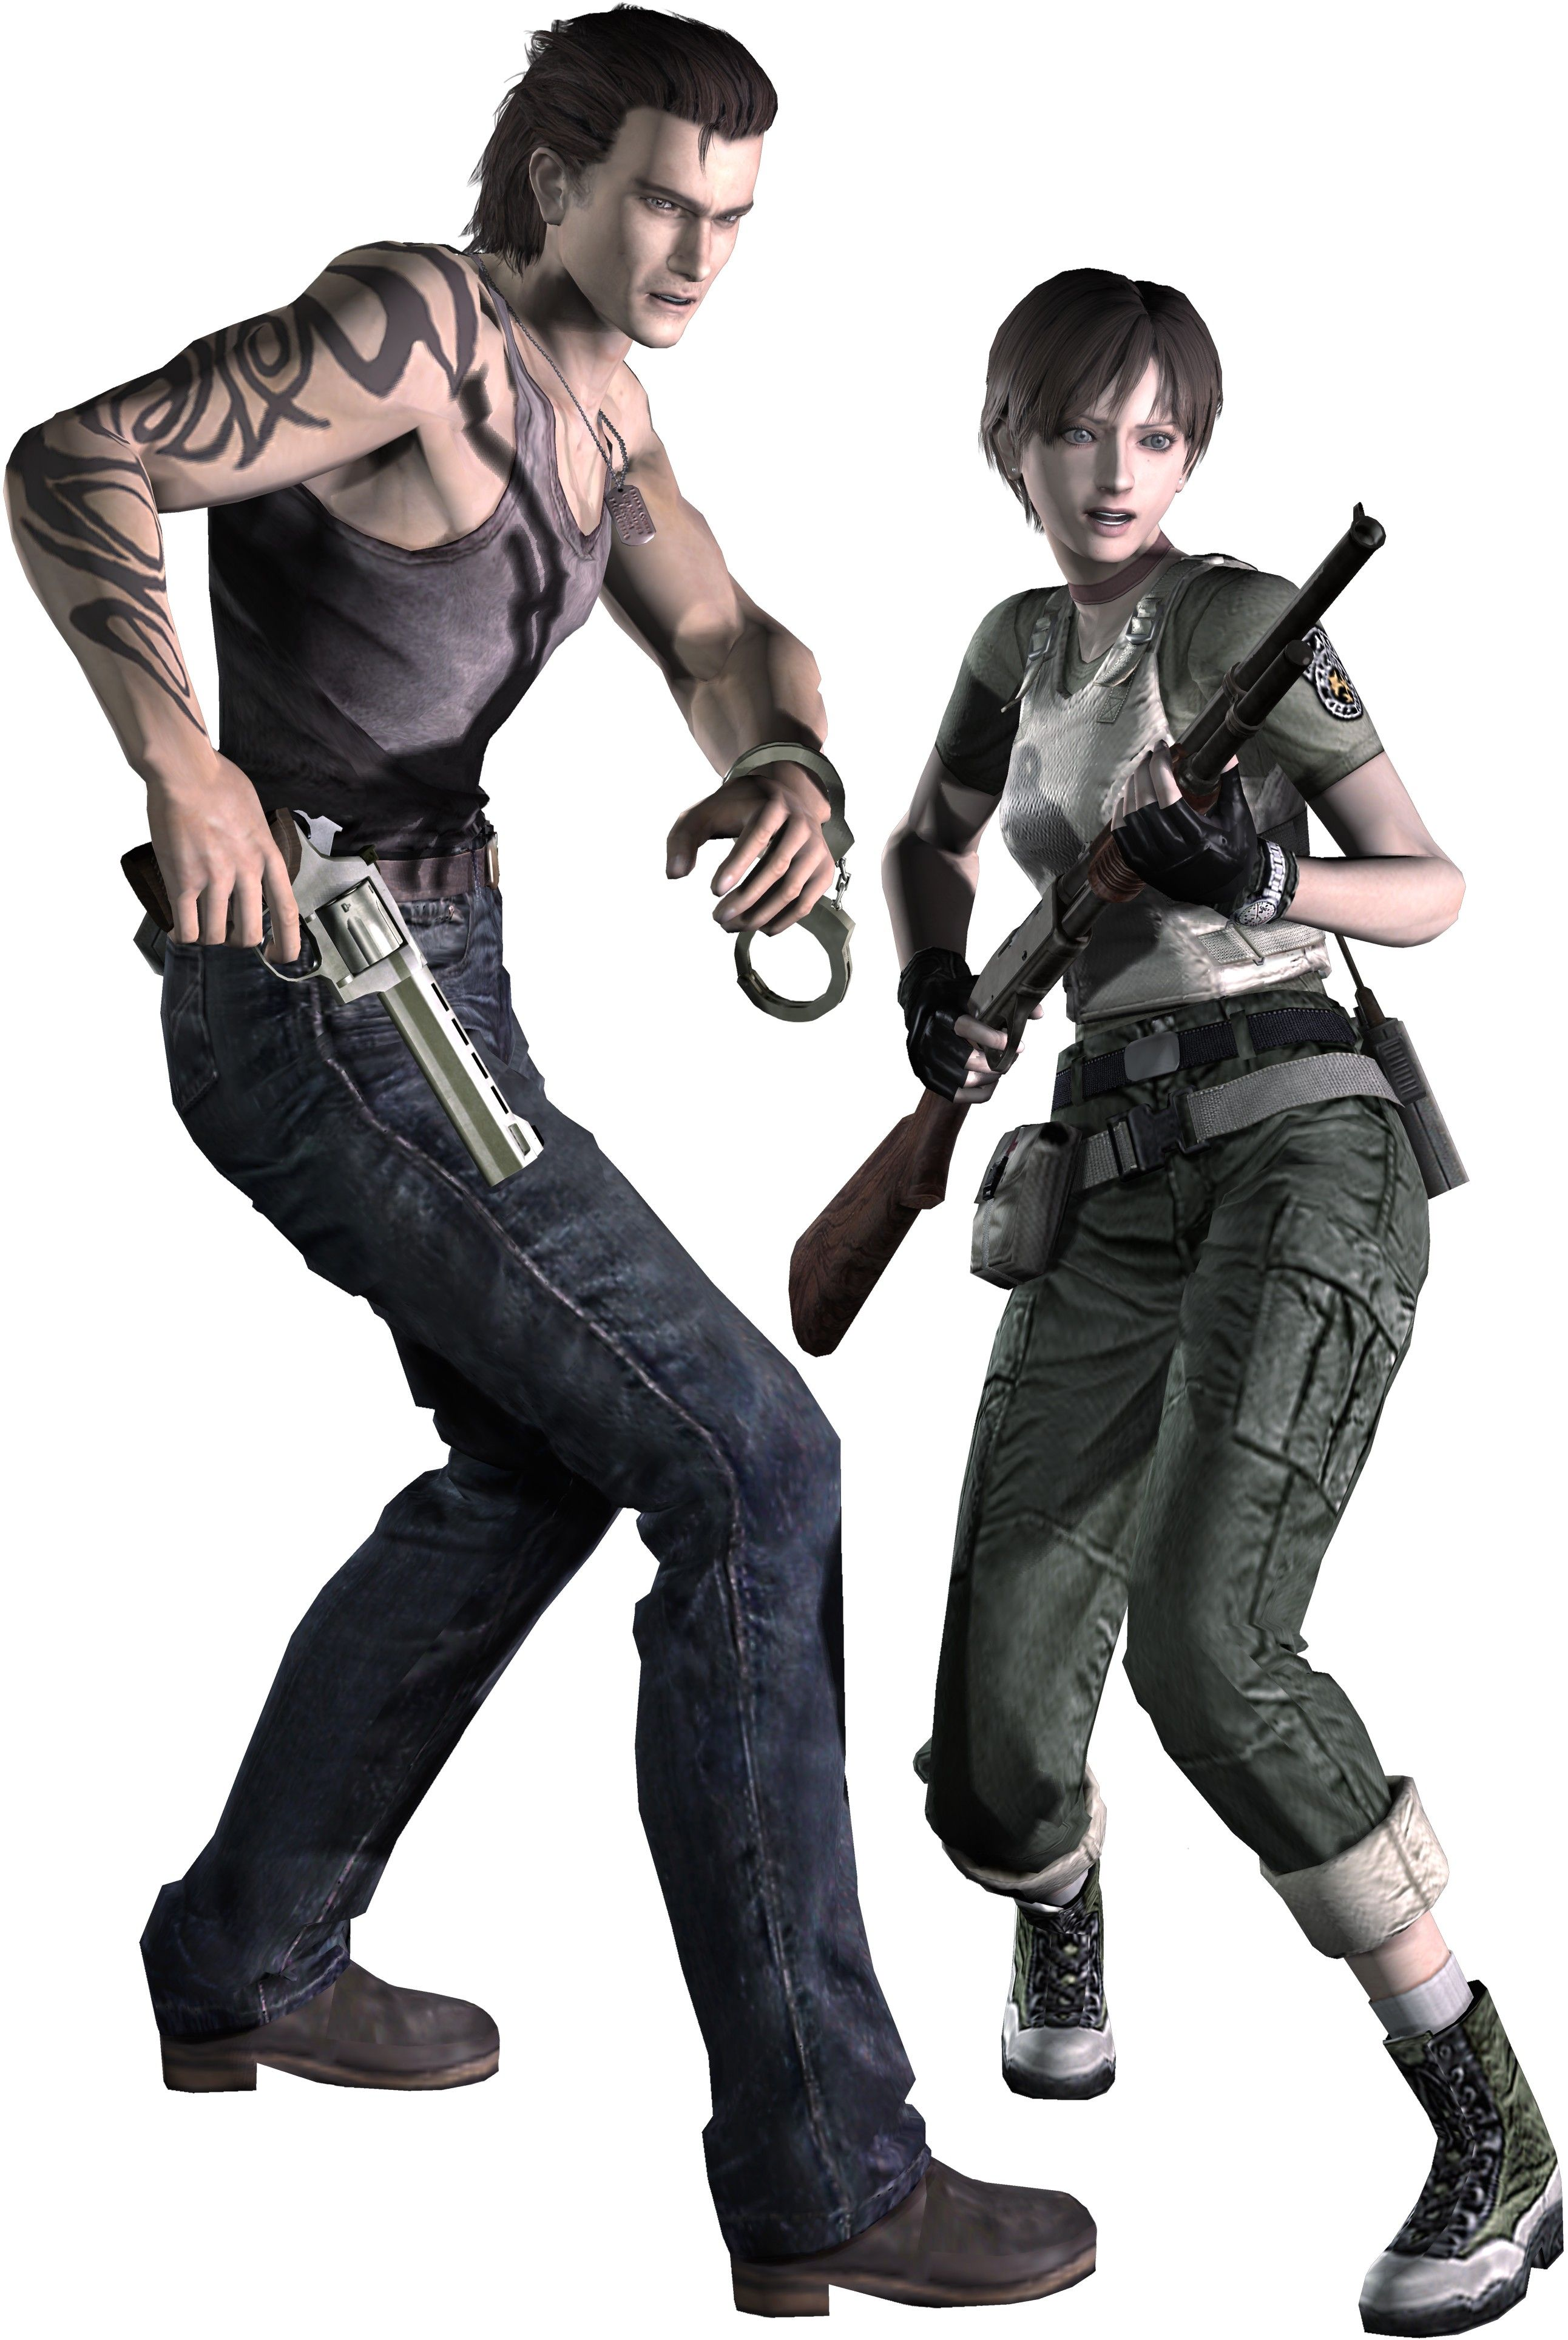 image Resident evil zero rebecca nude mod